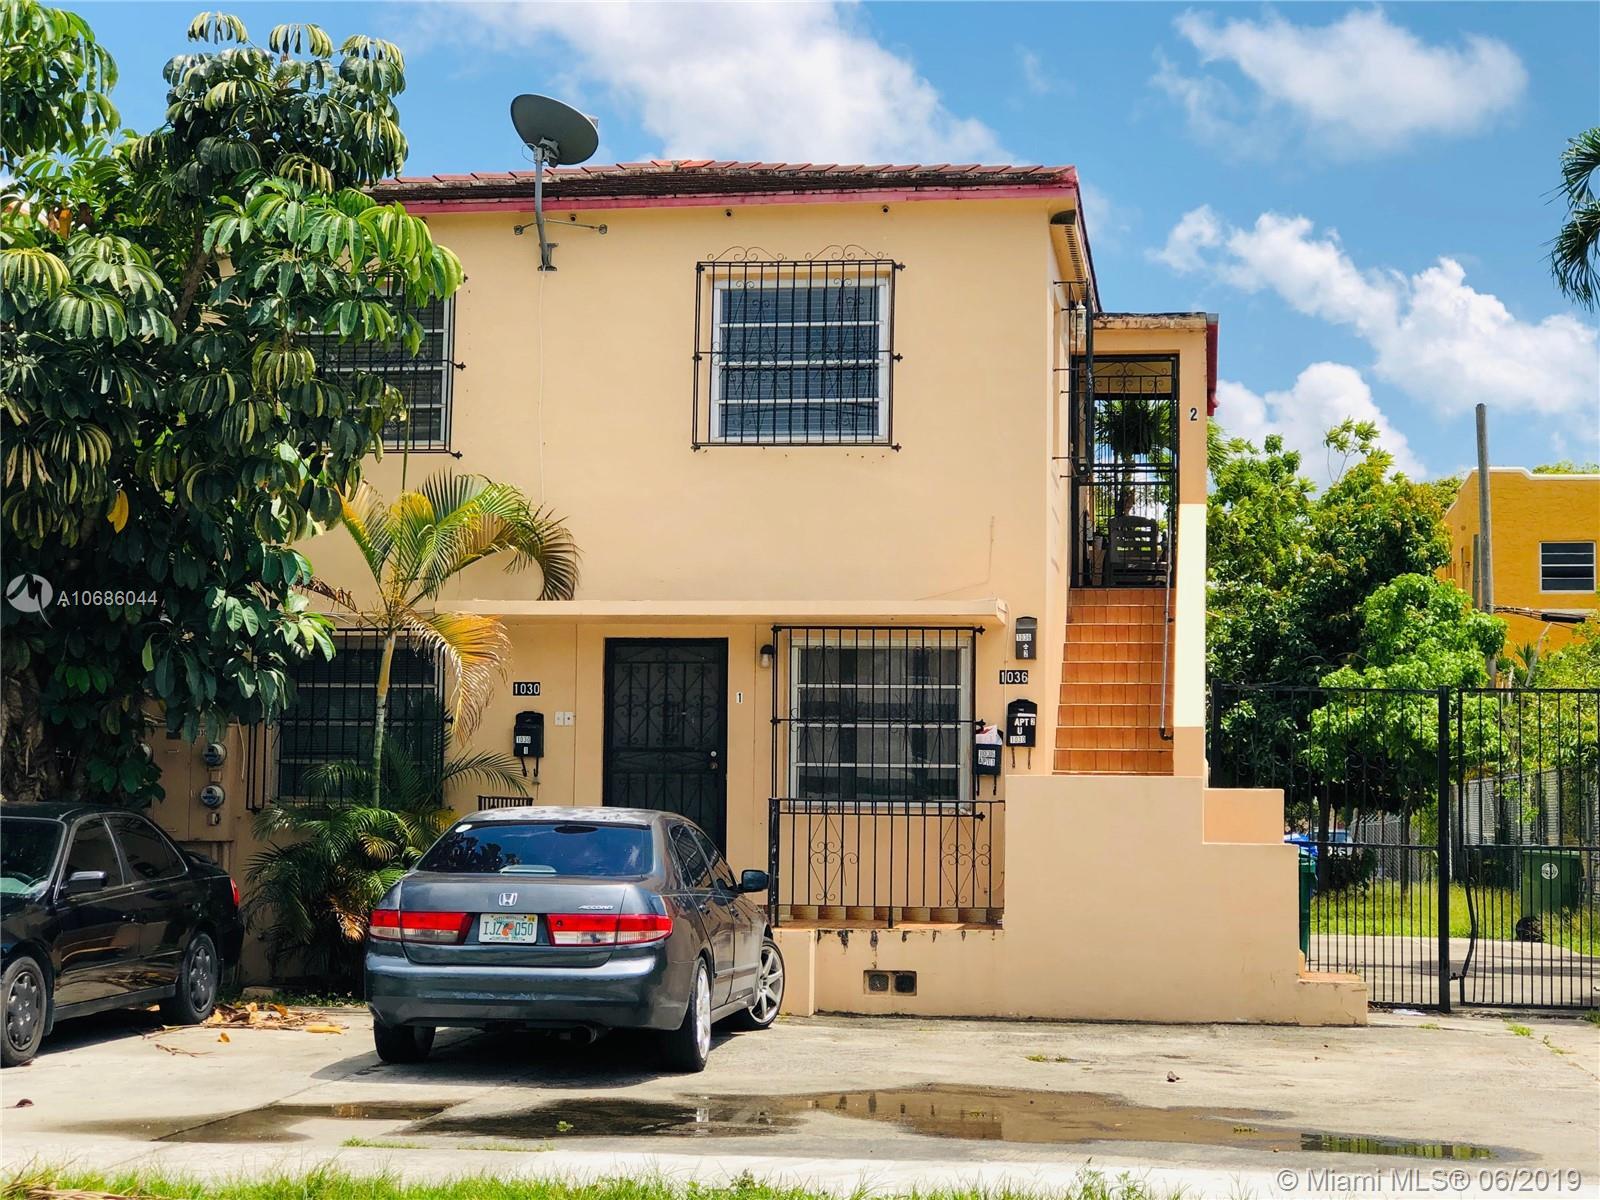 1030 NW 3rd St, Miami, FL 33128